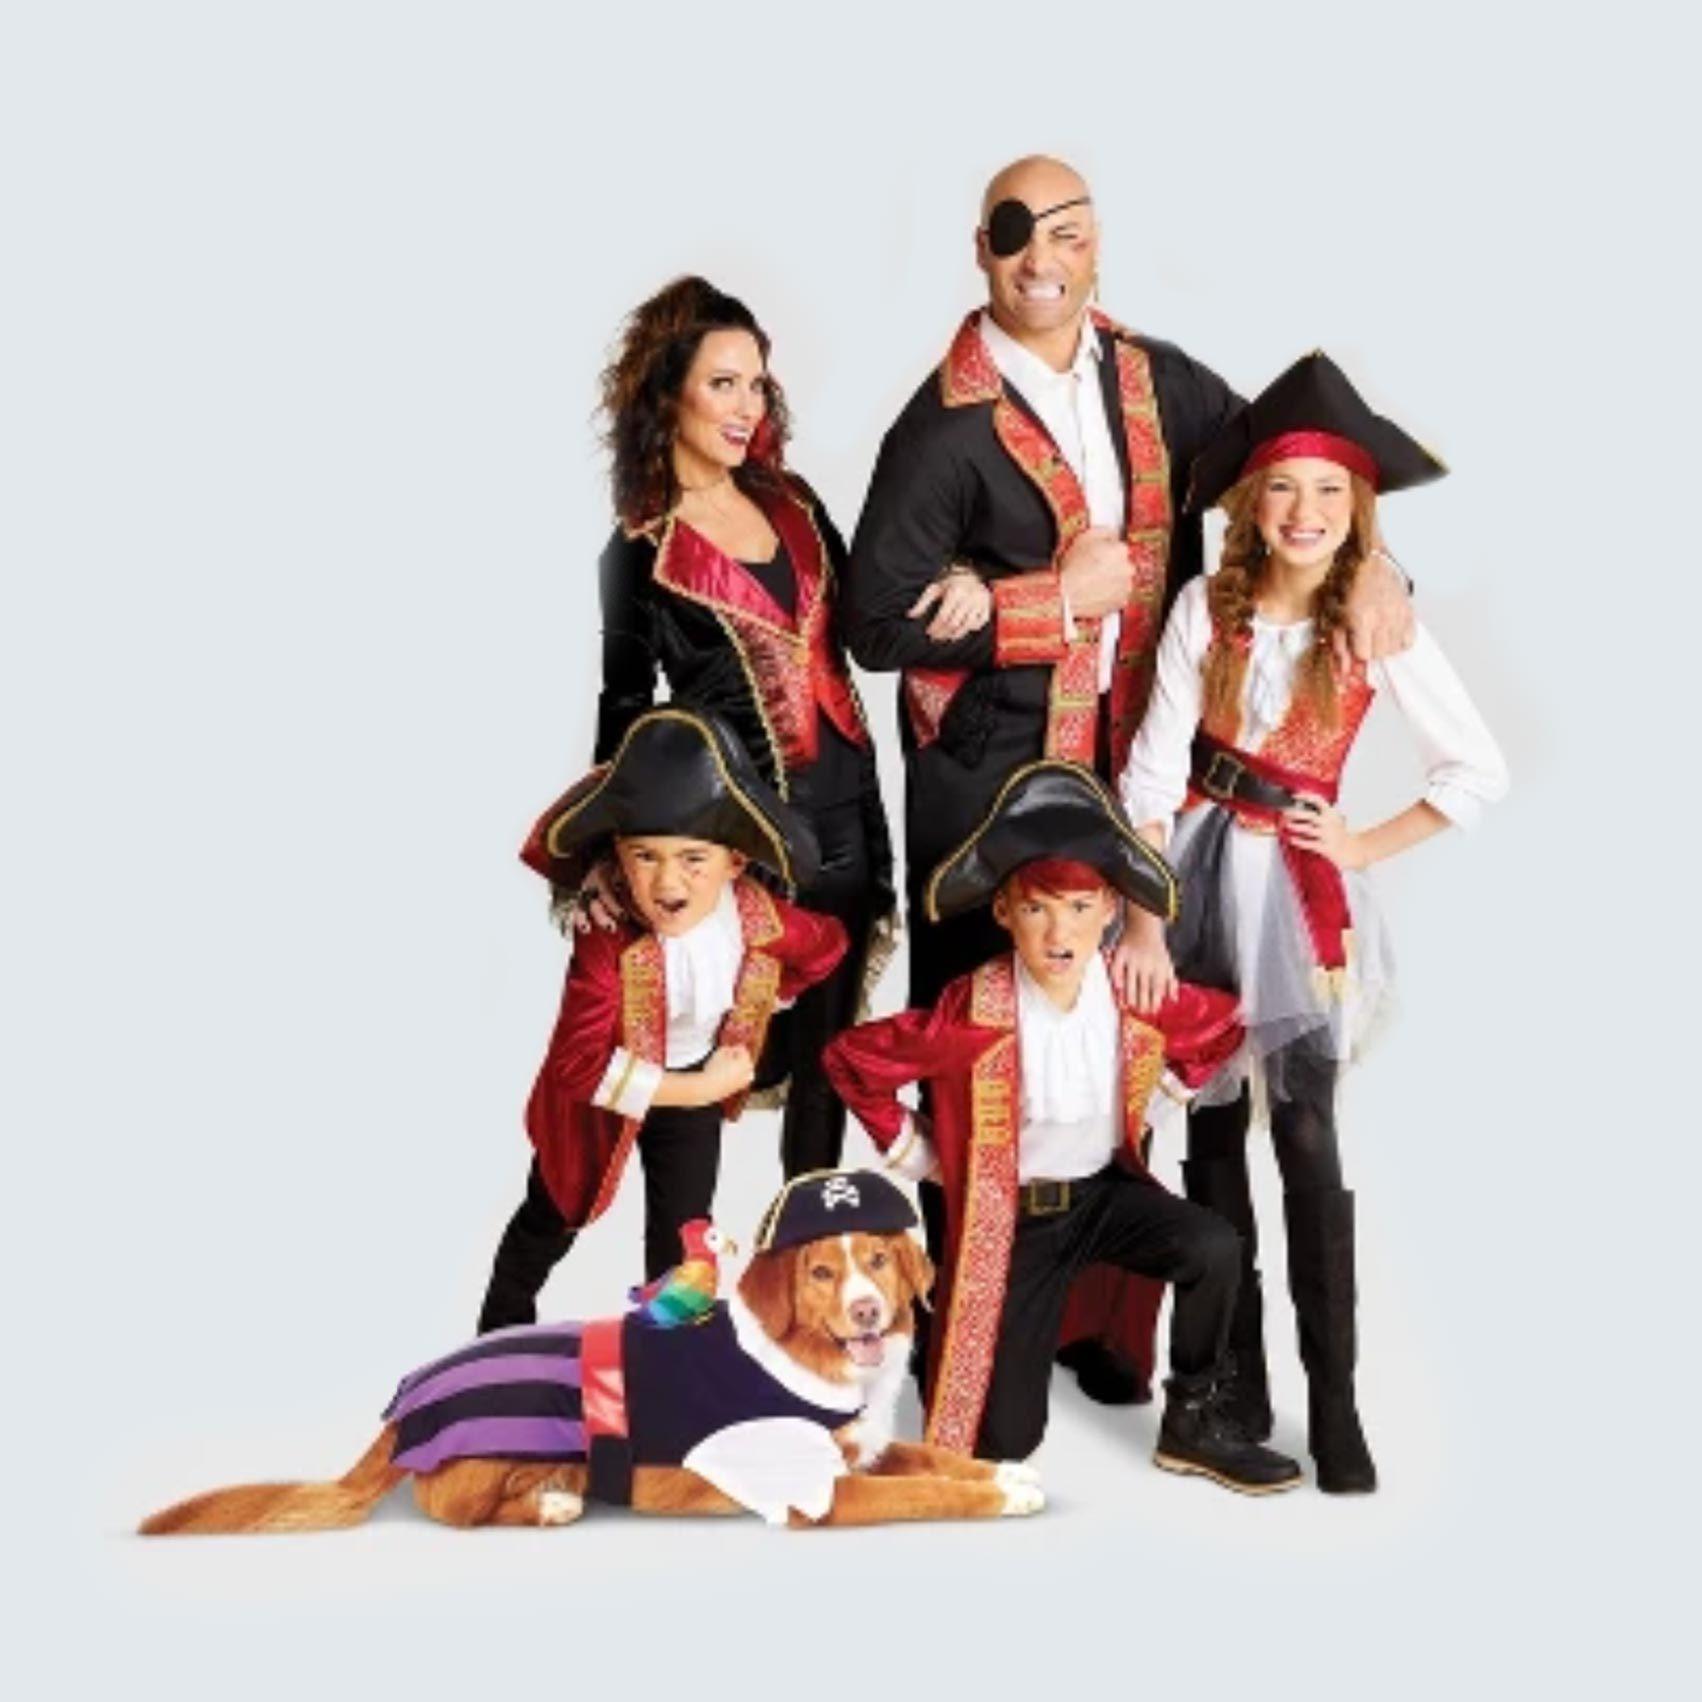 Pirate family halloween costume